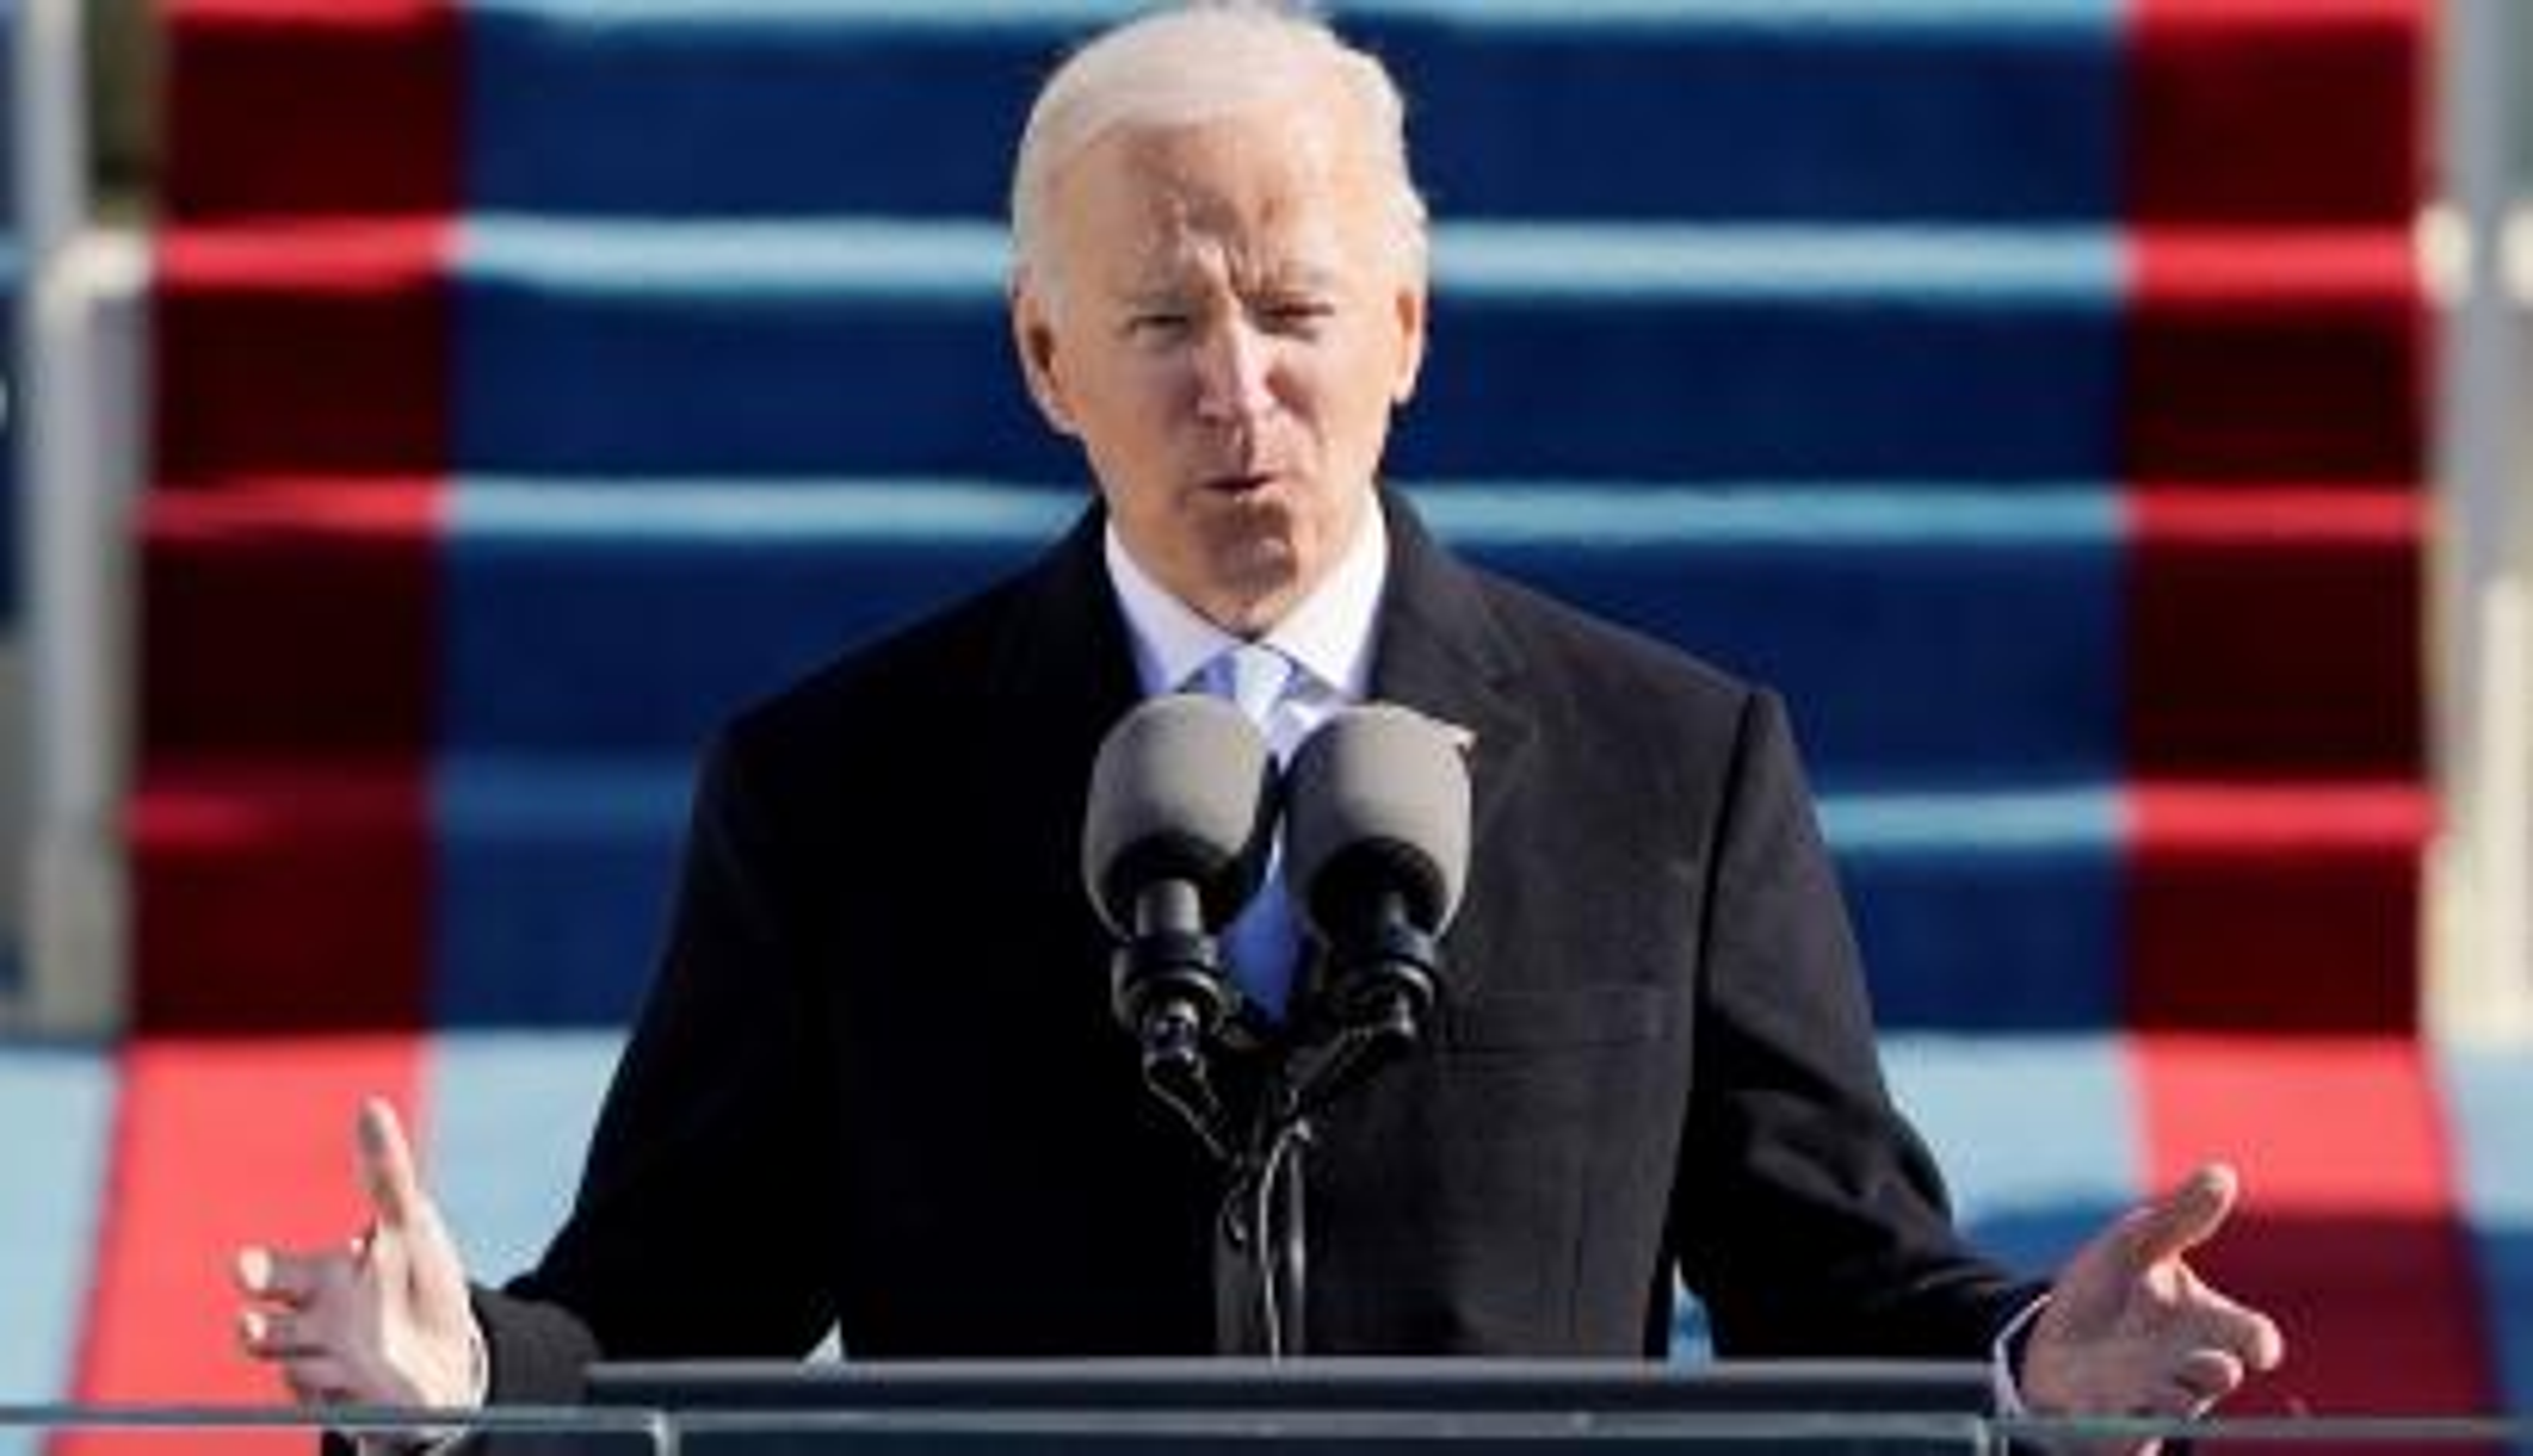 U.S. President Joe Biden speaks during inauguration at the U.S. Capitol in Washington January 20, 2021.